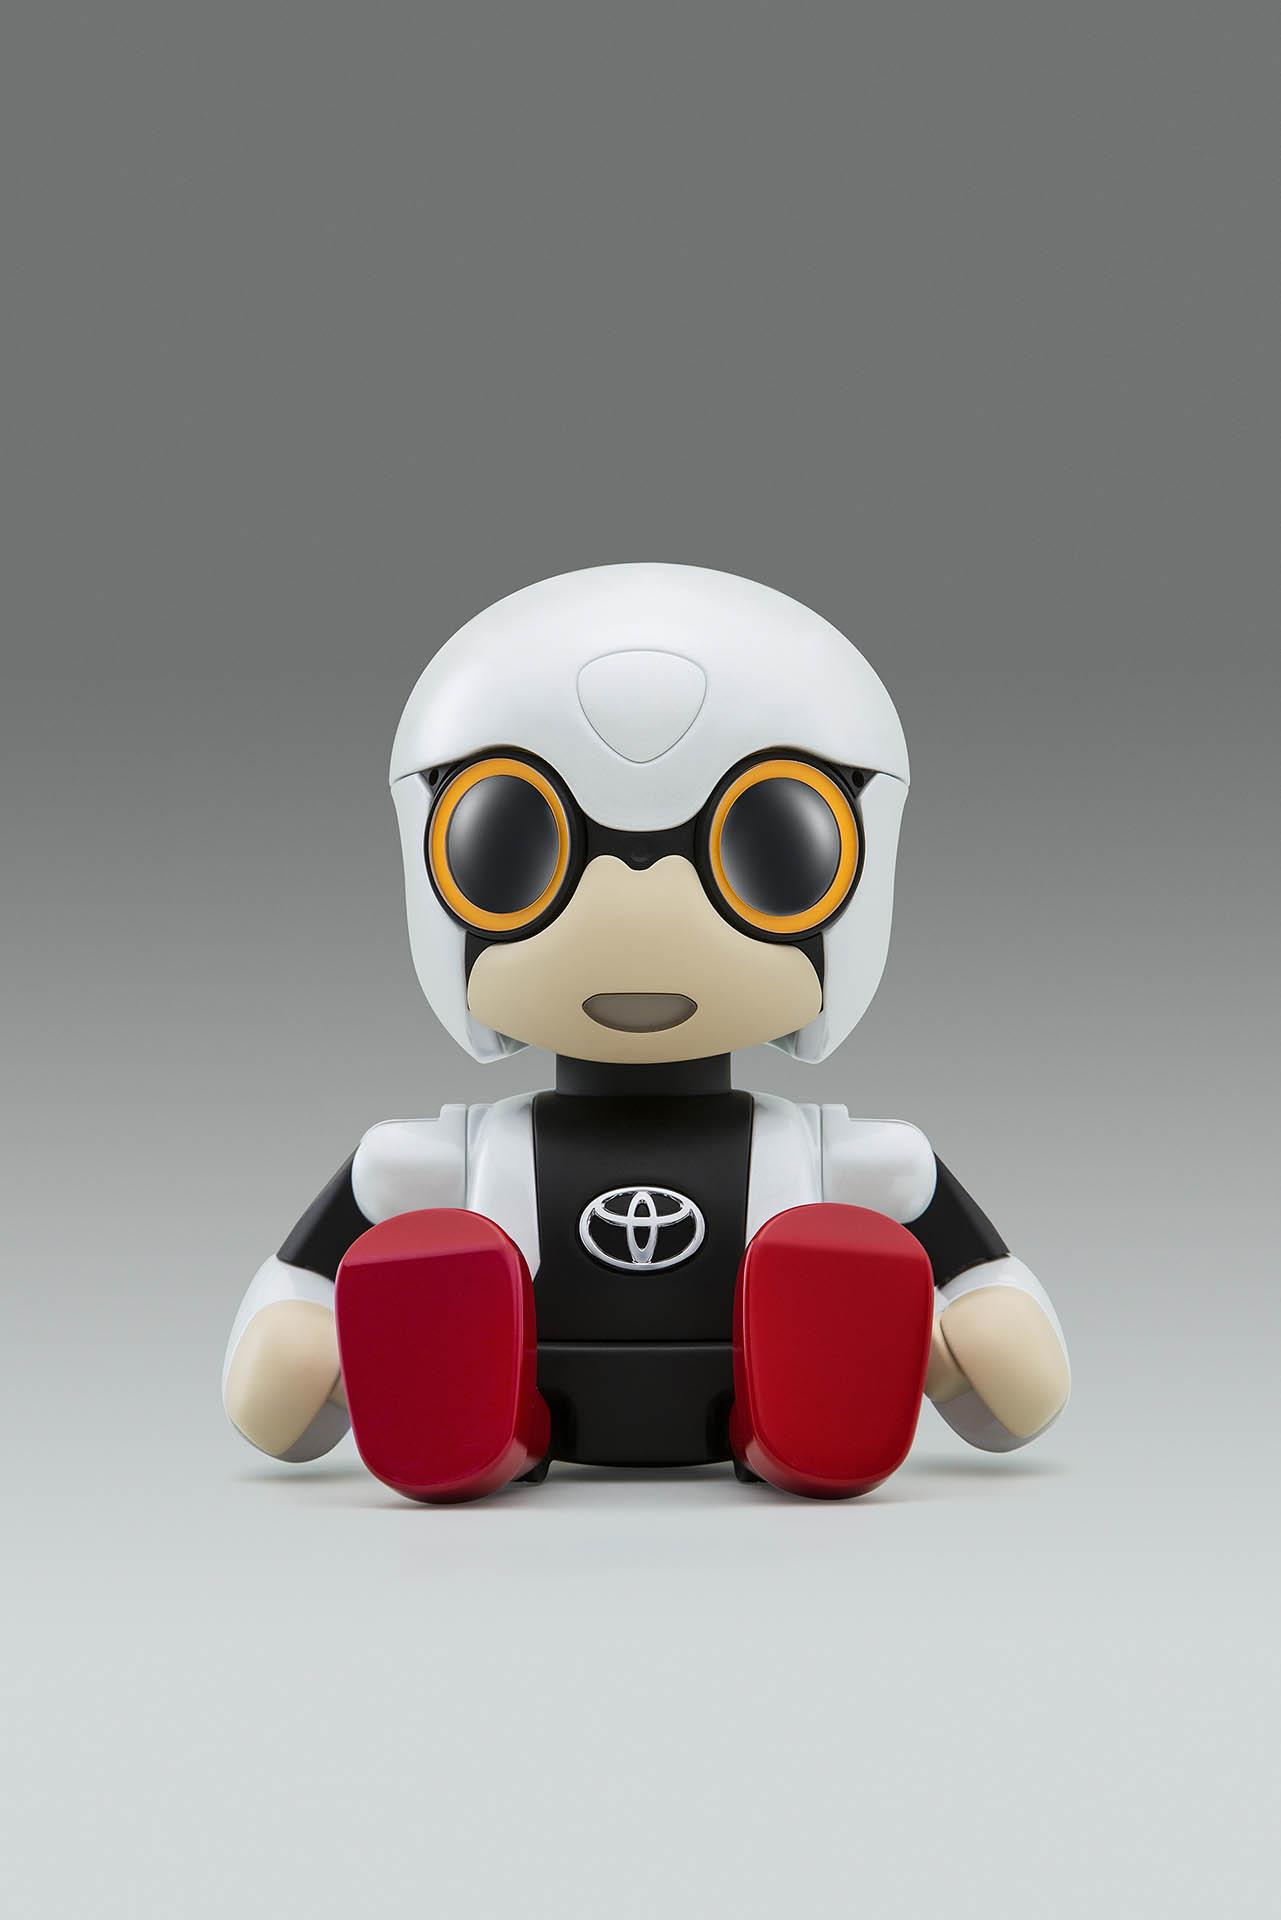 Toyota Kirobo Mini Robot 2 The News Wheel